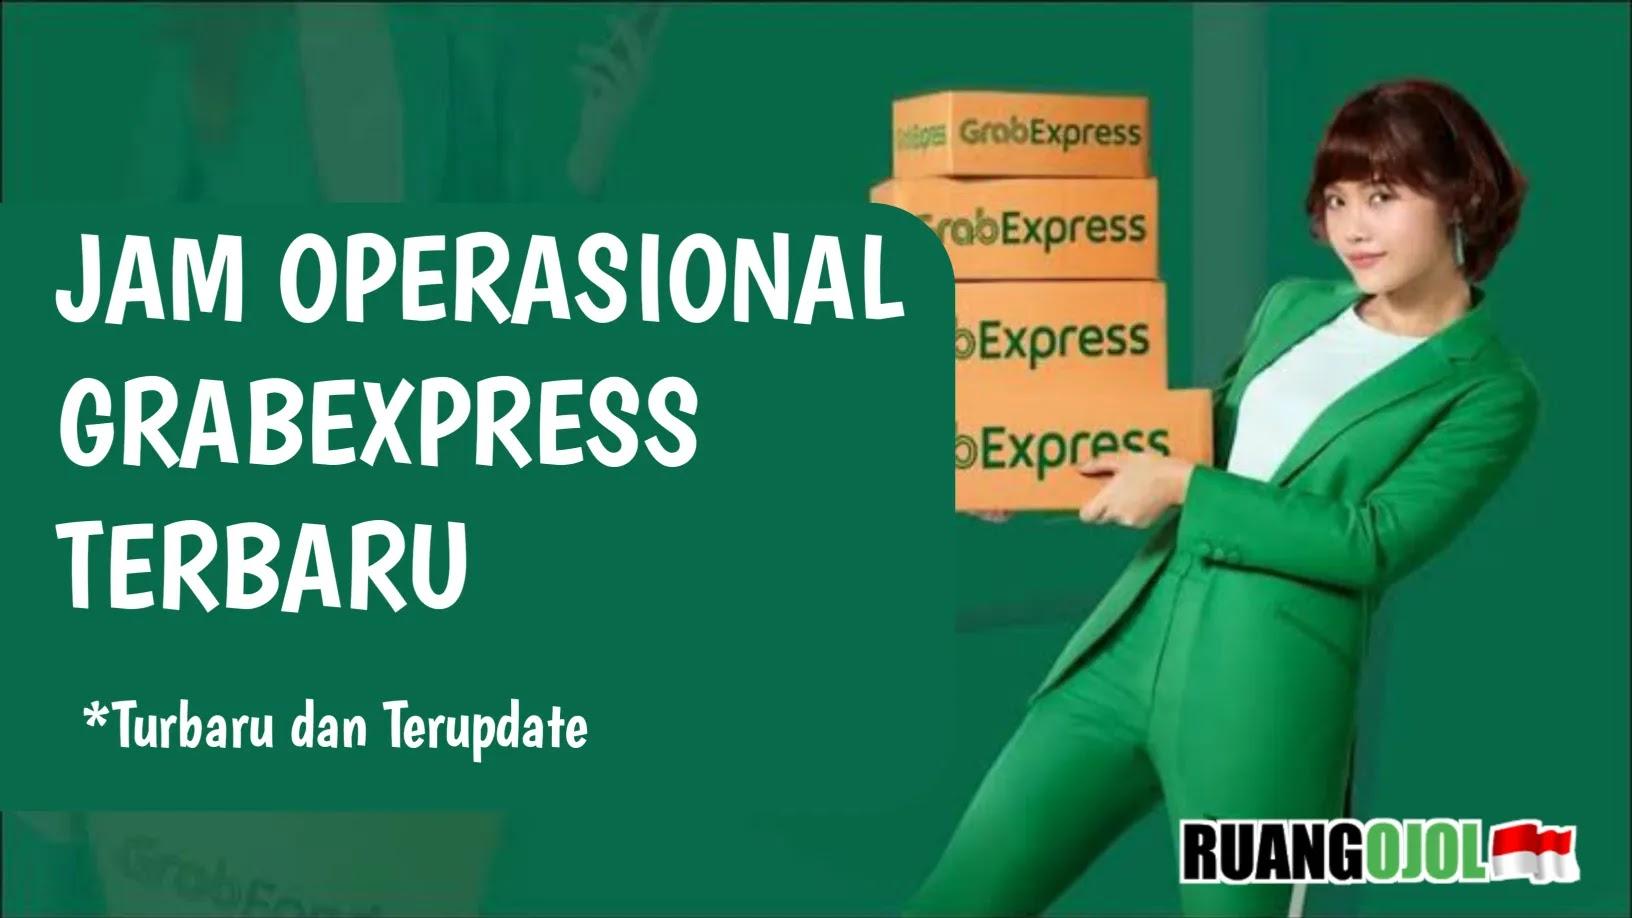 Mengetahui Jam Operasional GrabExpress  (Instan, Sameday, Car)